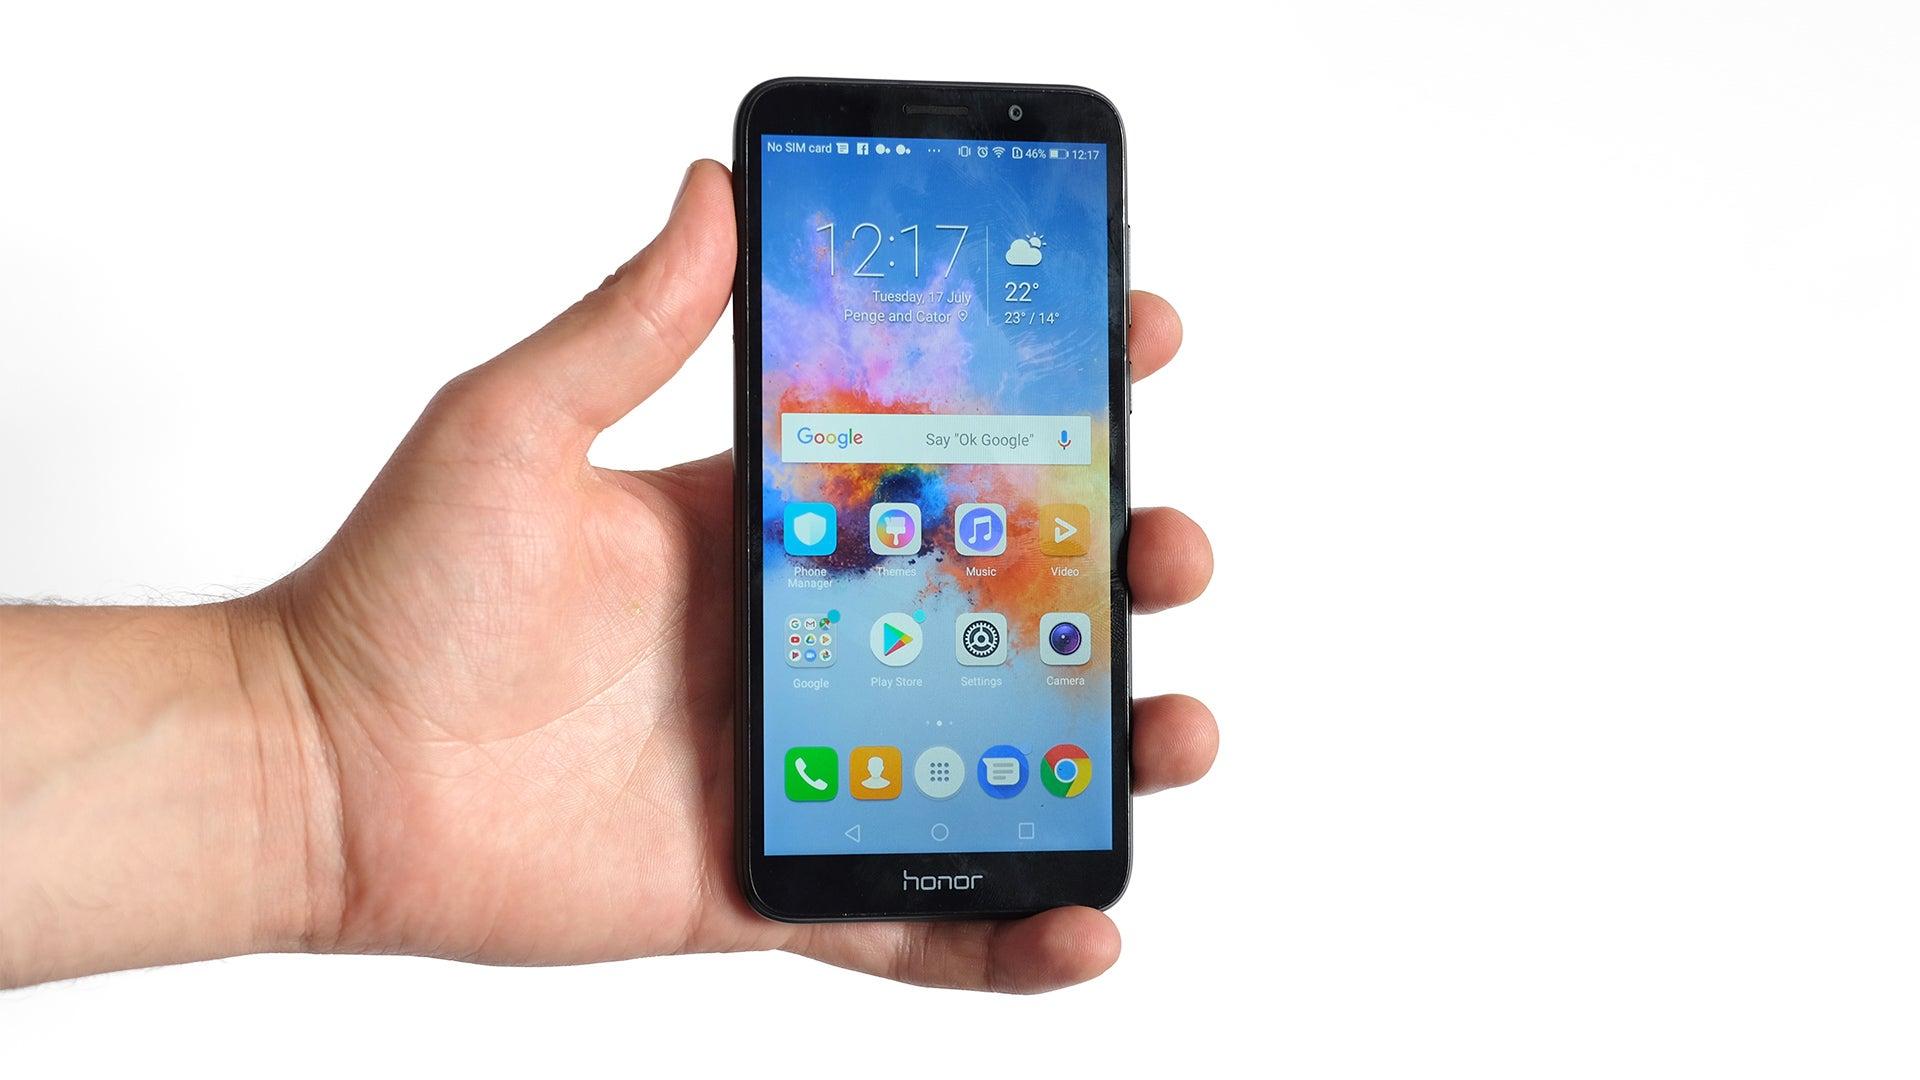 Honor 7S 16G - گوشی موبایل آنر ۷اس